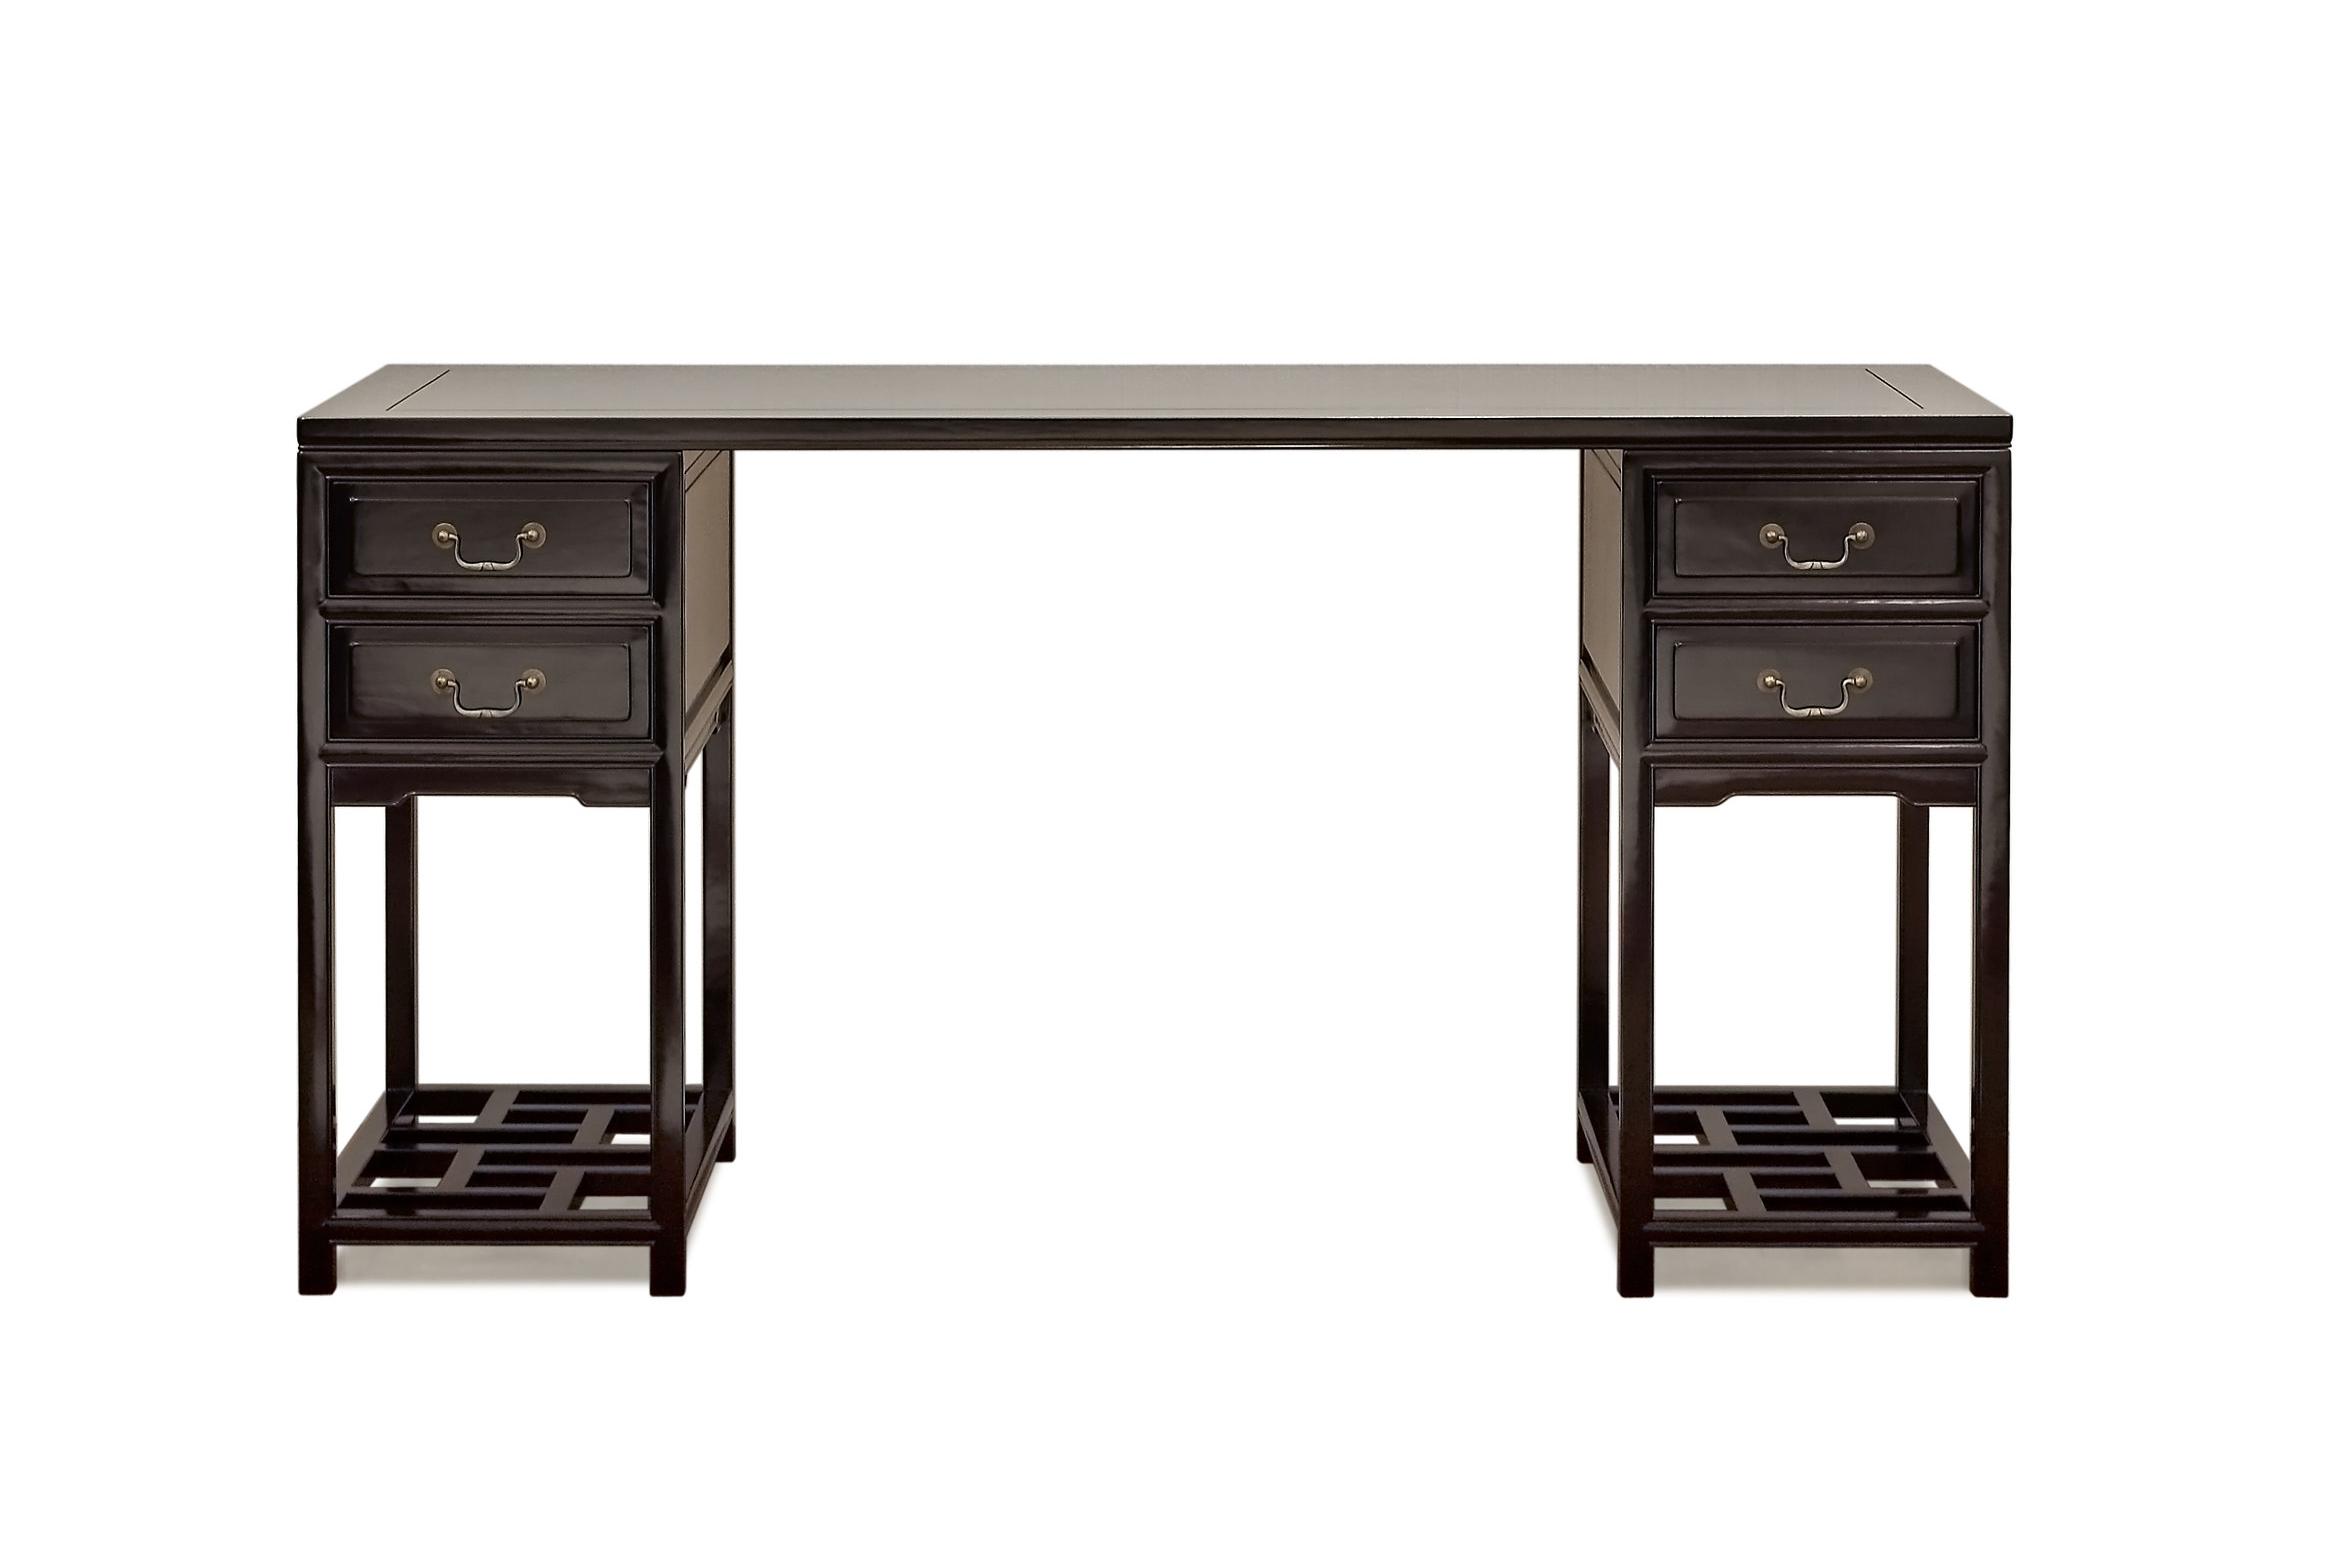 ....Ming Style Chinese furniture : Trestle Desk..明式中式家具: 医生书桌....